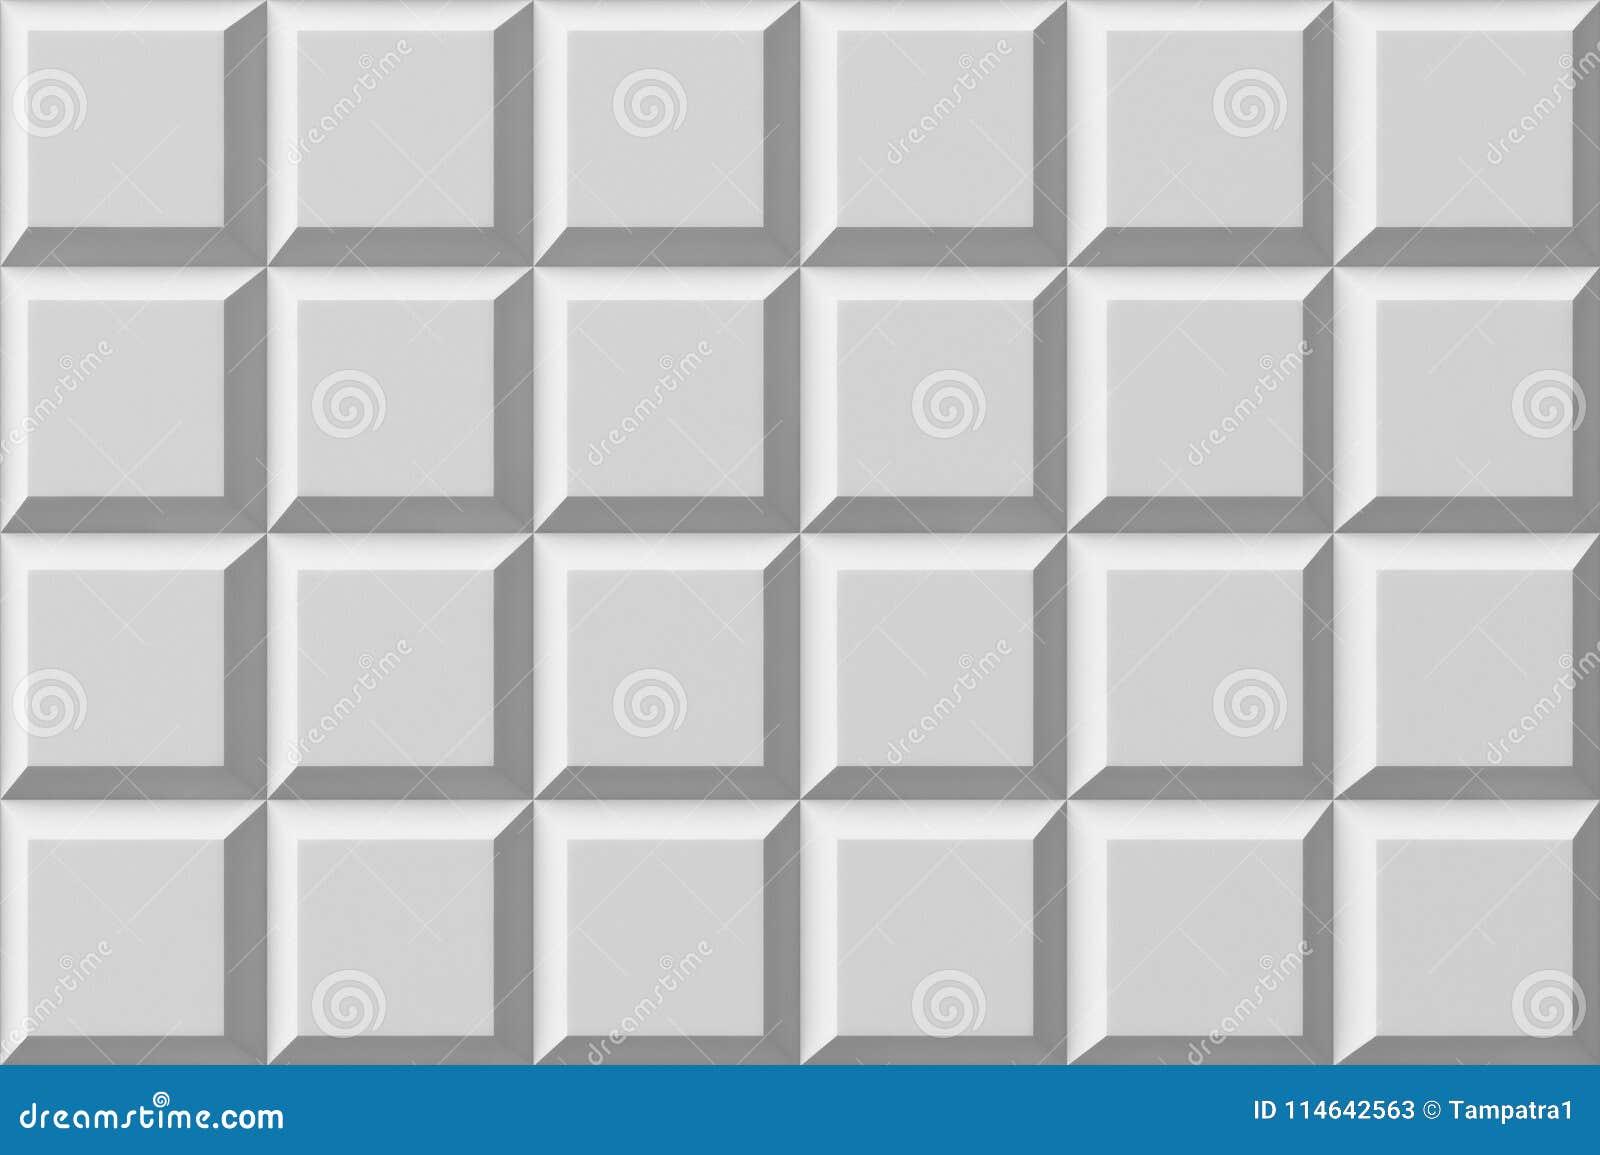 Download White Tile Flooring Seamless Texture Pattern Background 3d Stock Illustration